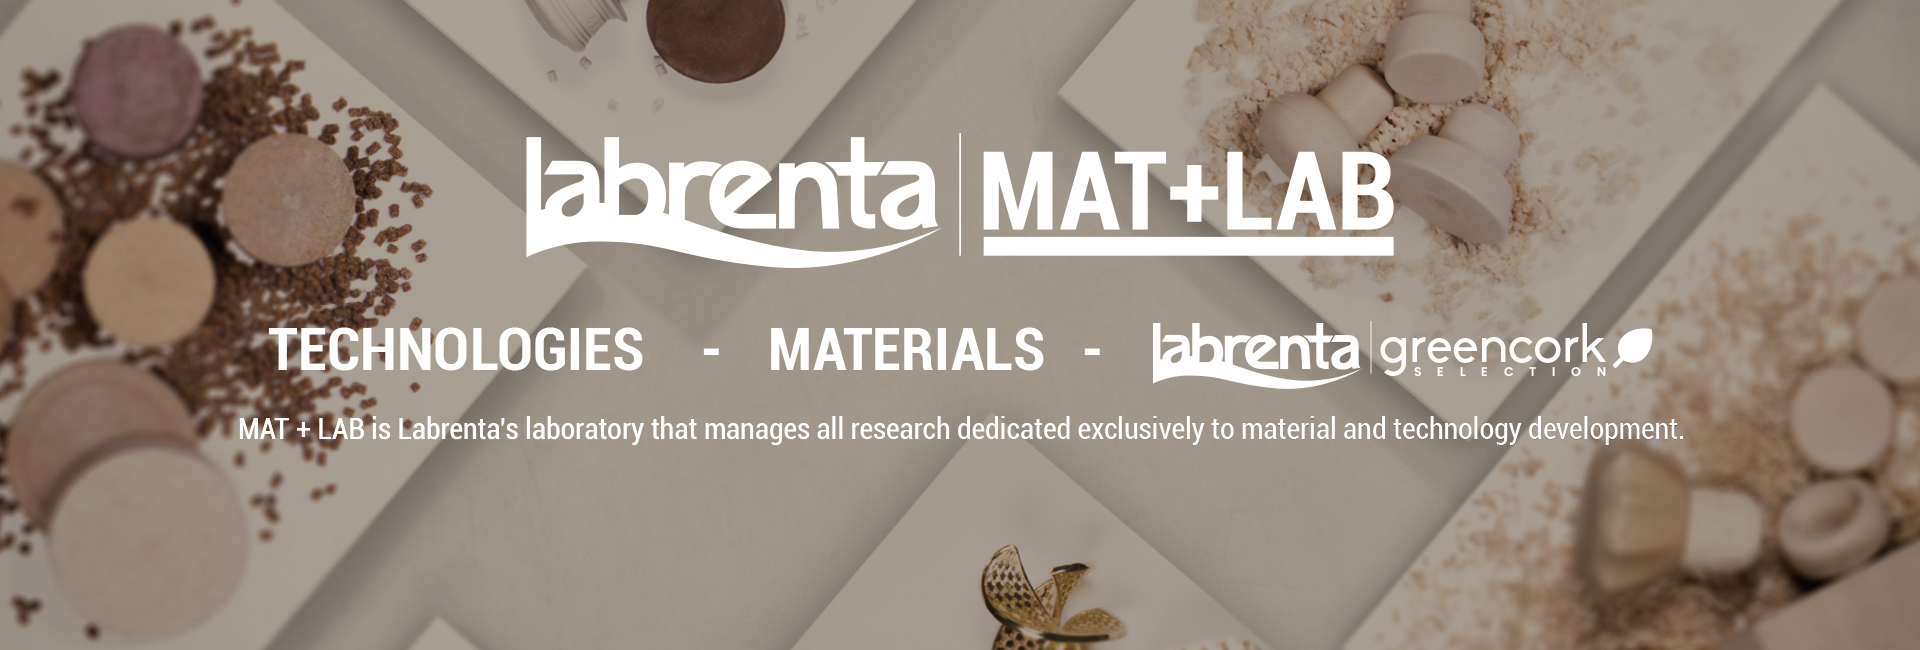 Mat+Lab